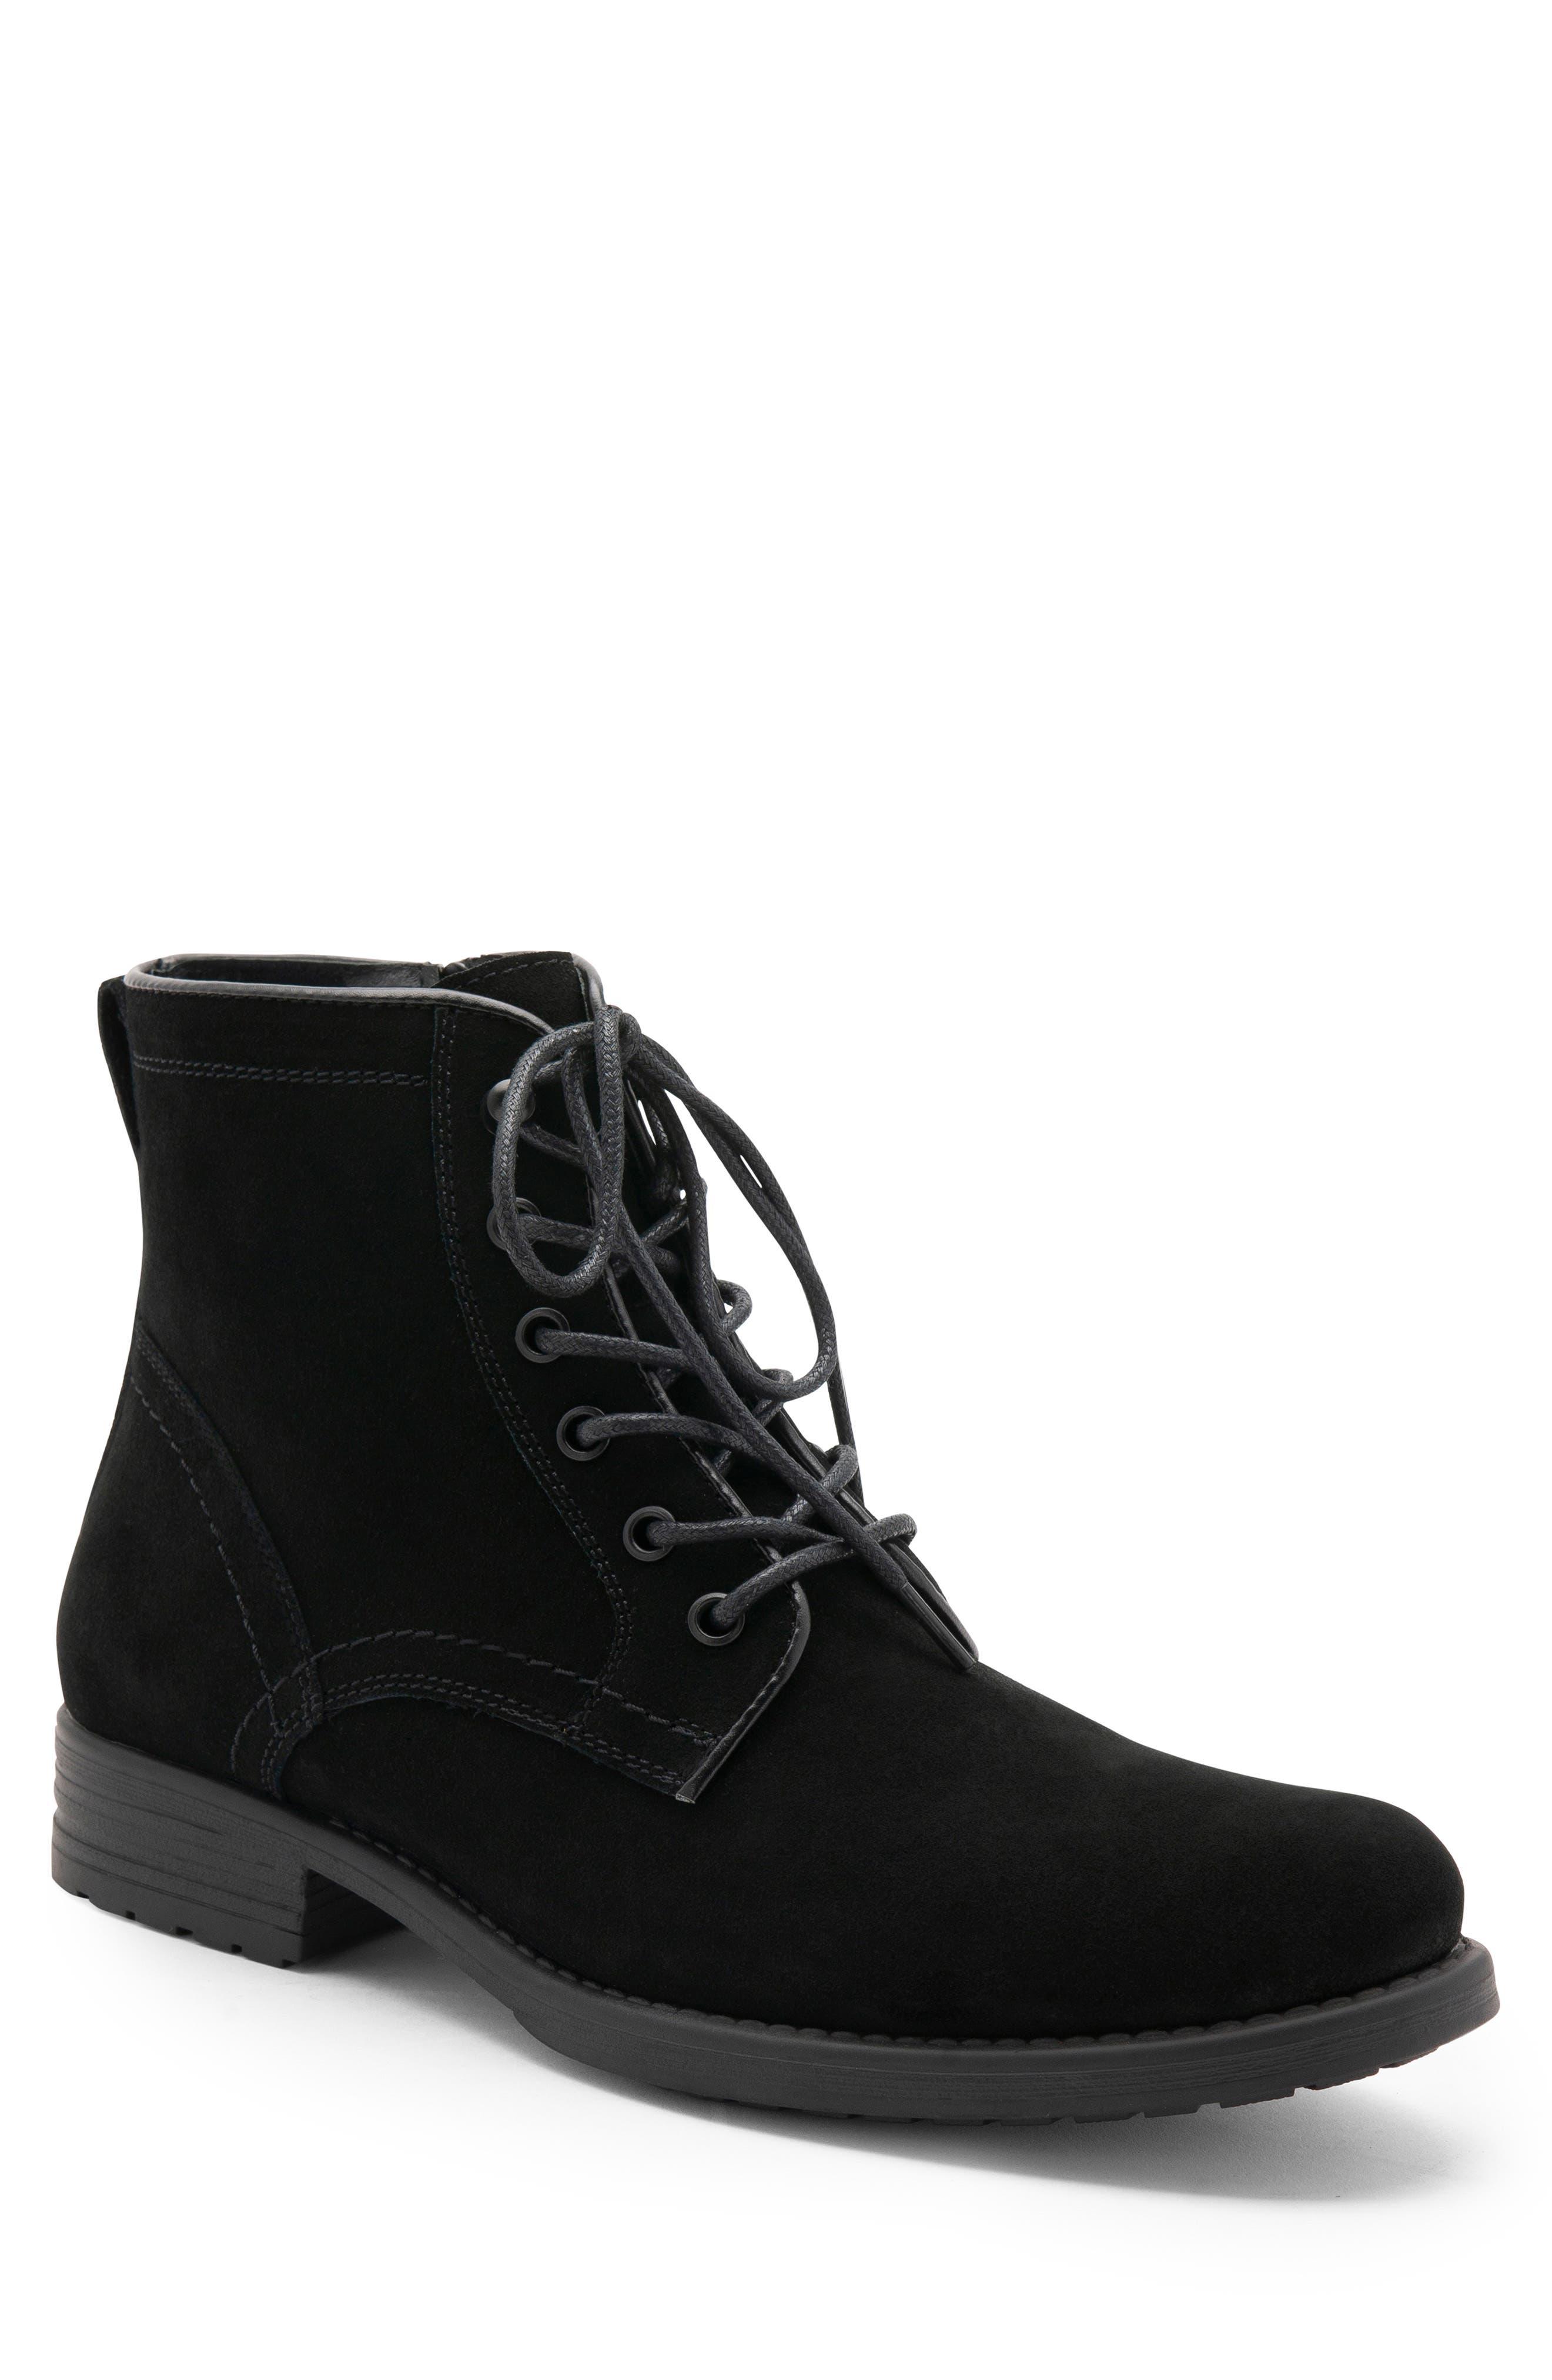 BLONDO Peter Waterproof Plain Toe Boot, Main, color, BLACK SUEDE